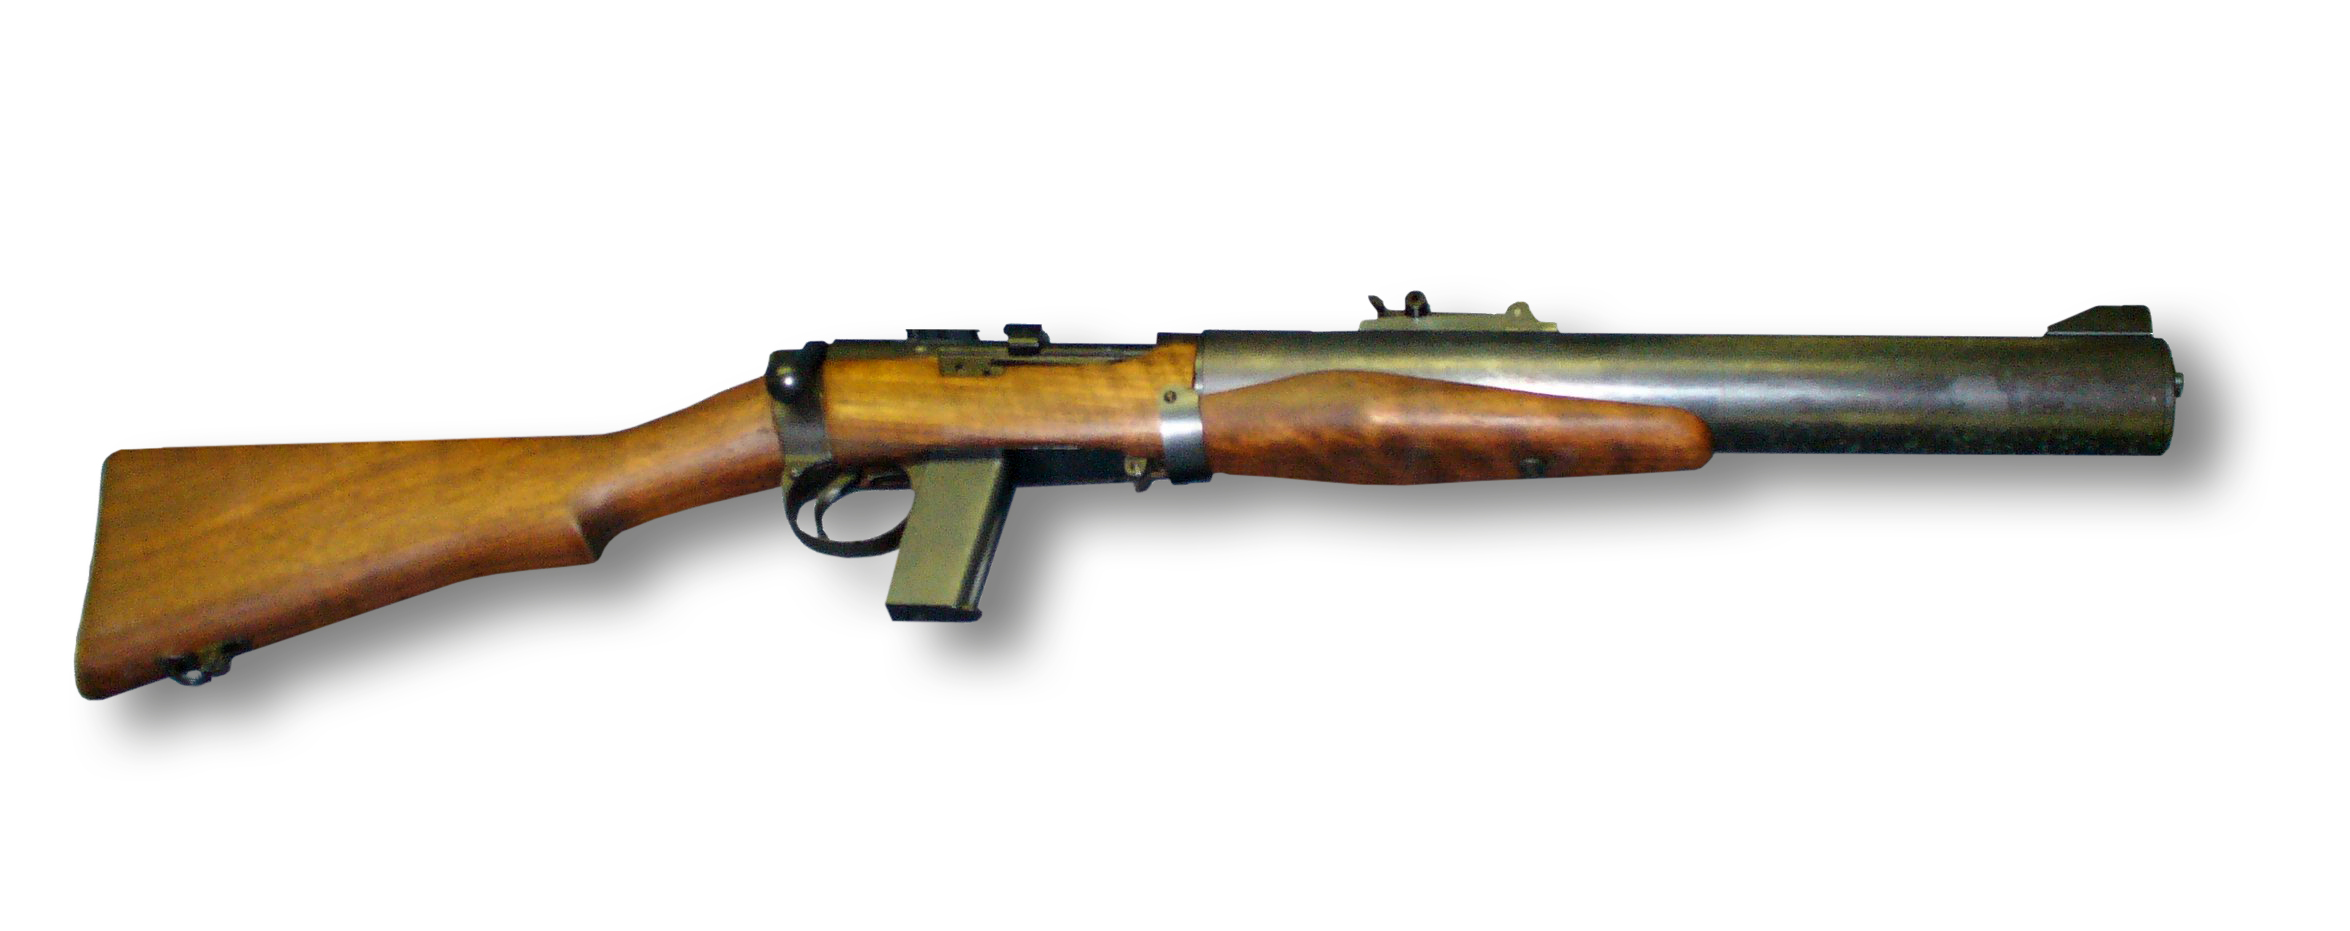 Survival rifle ww2